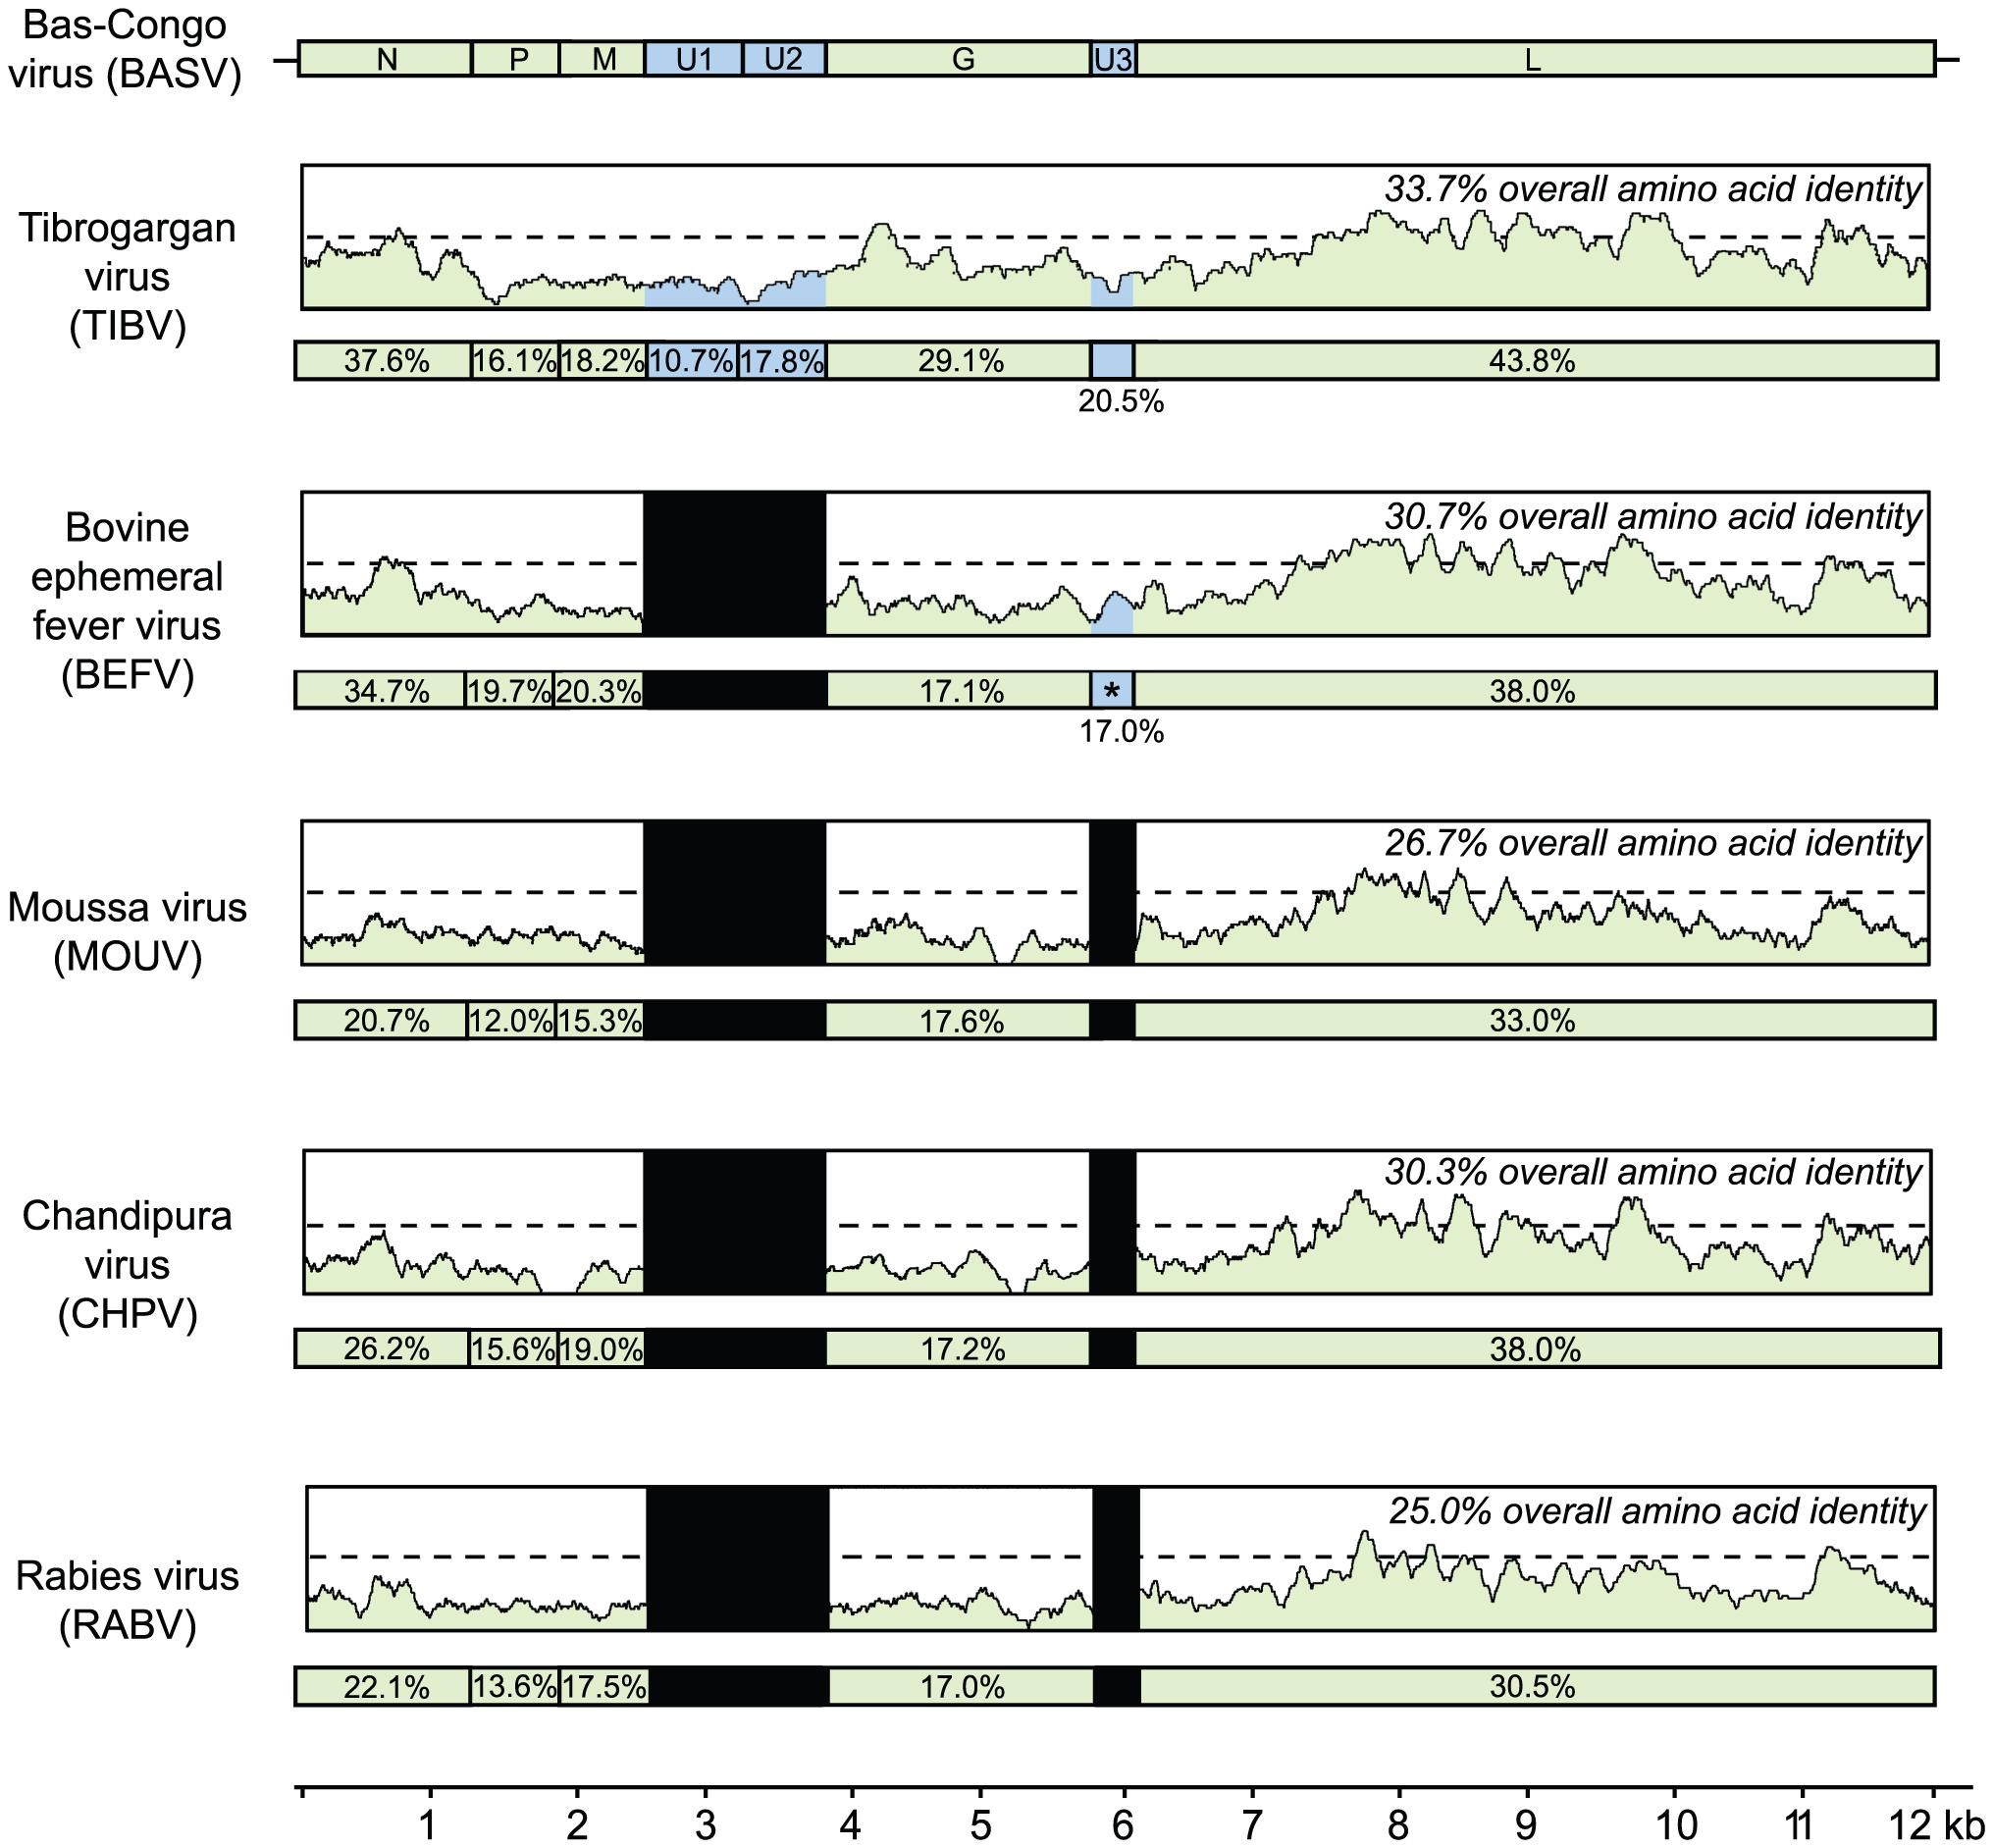 Schematic representation of the genome organization of BASV and its protein similarity plot compared to representative rhabdoviruses.